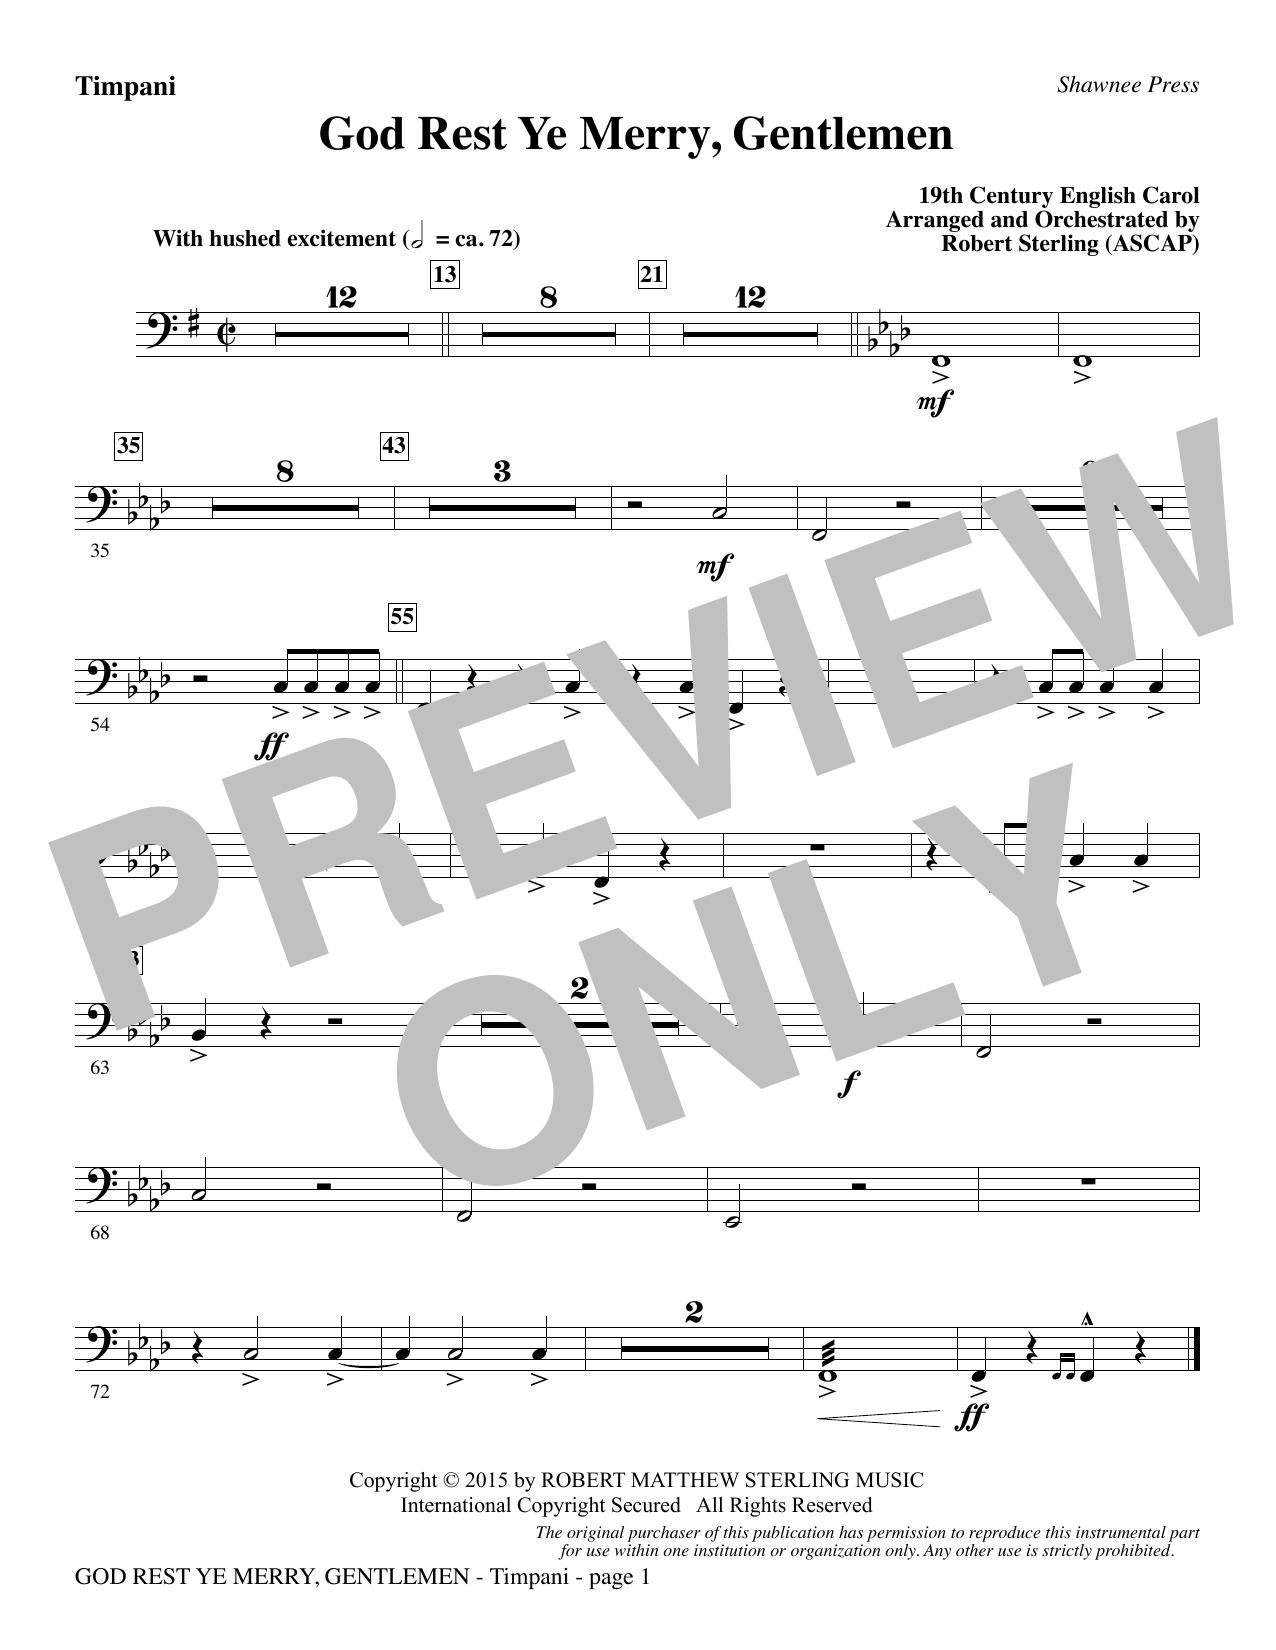 God Rest Ye Merry, Gentlemen - Timpani sheet music